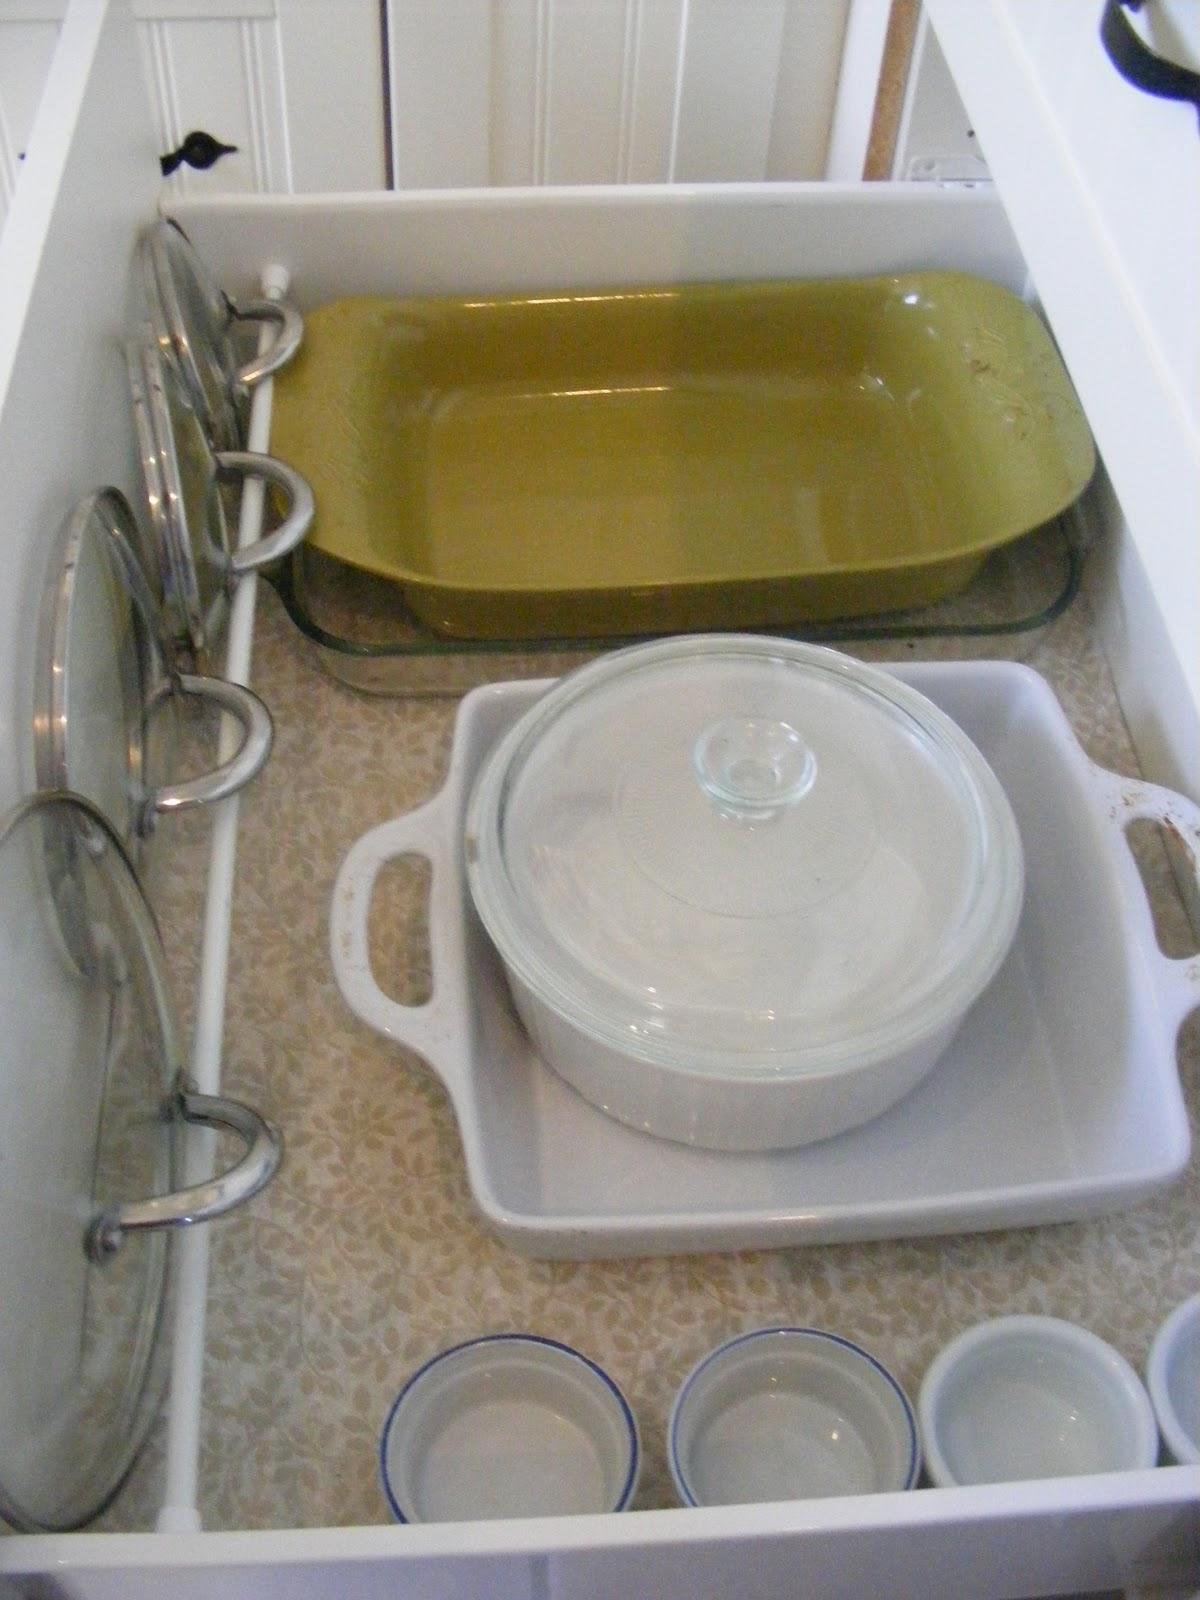 Kitchen Organization Ideas Kitchen Organizing Tips and Tricks